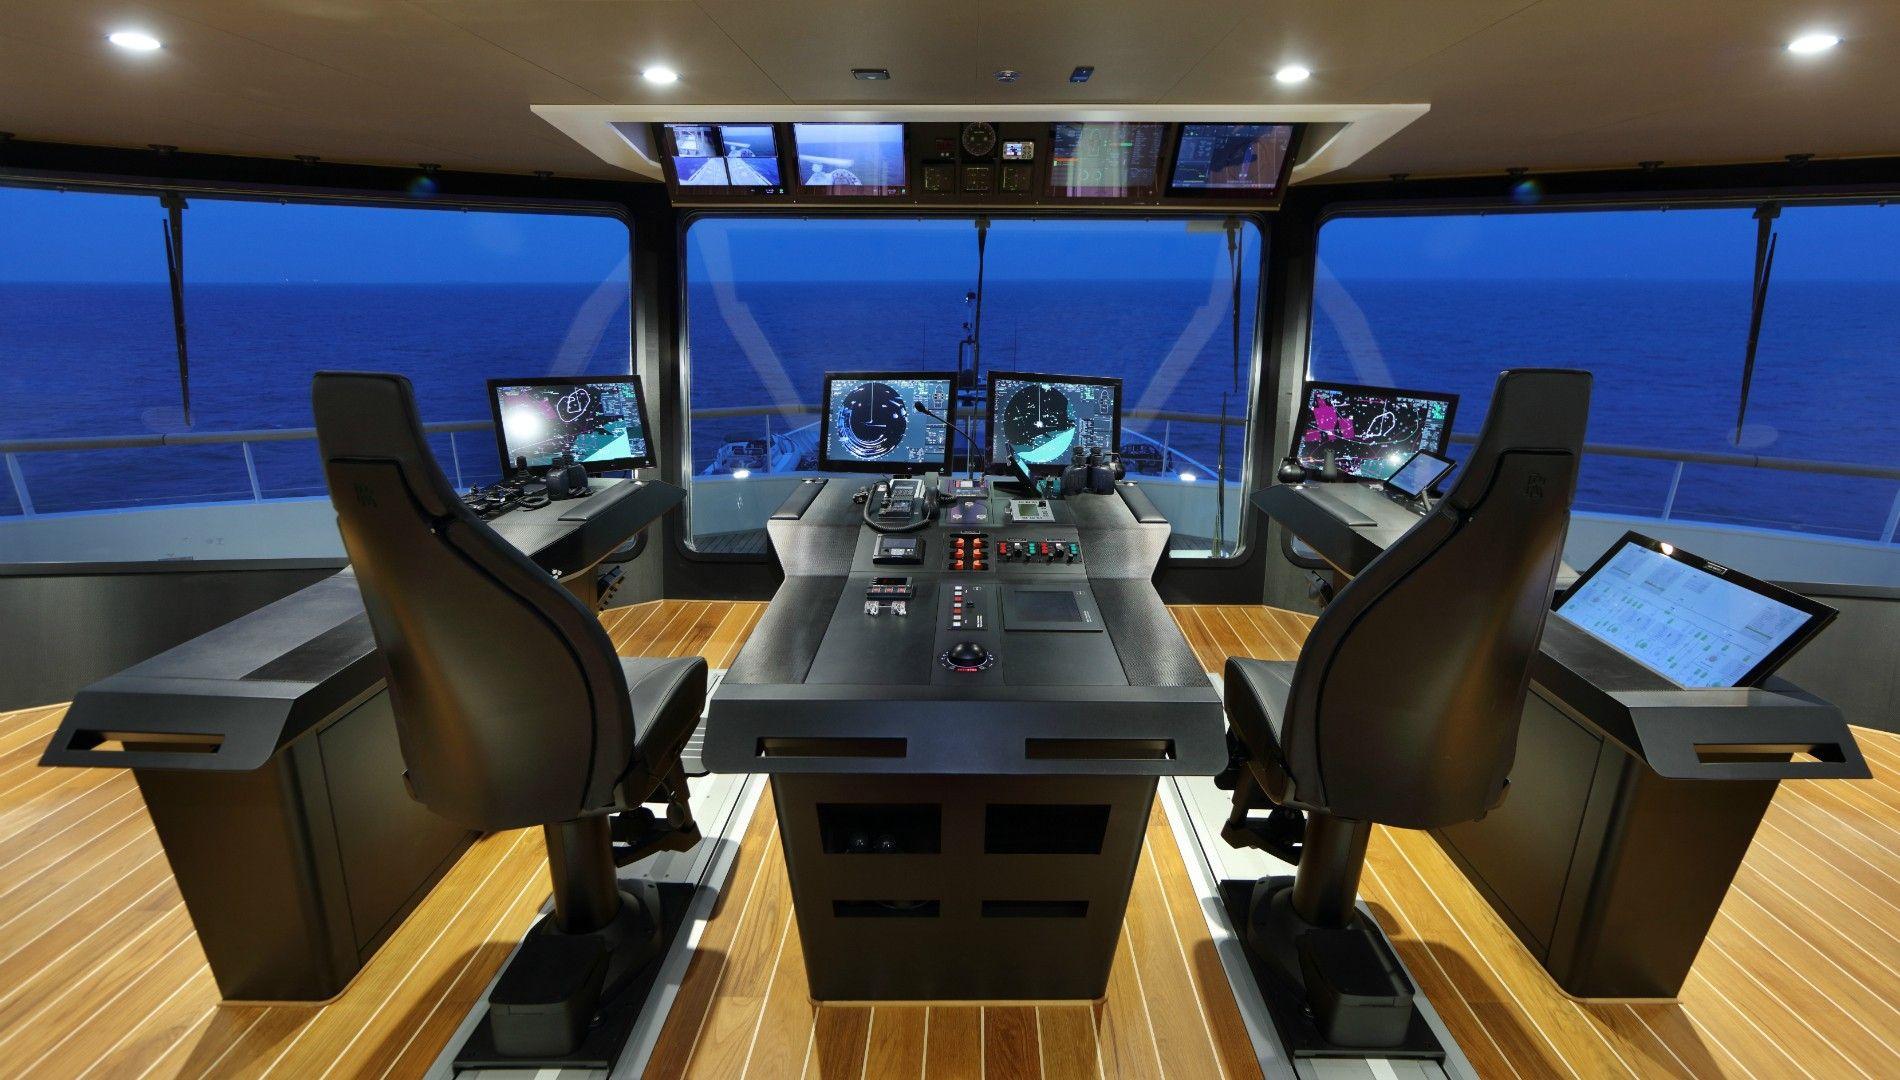 Luxury superyacht keyla interior by hot lab luxury yacht charter - Luxury Superyacht Keyla Interior By Hot Lab Luxury Yacht Charter 16